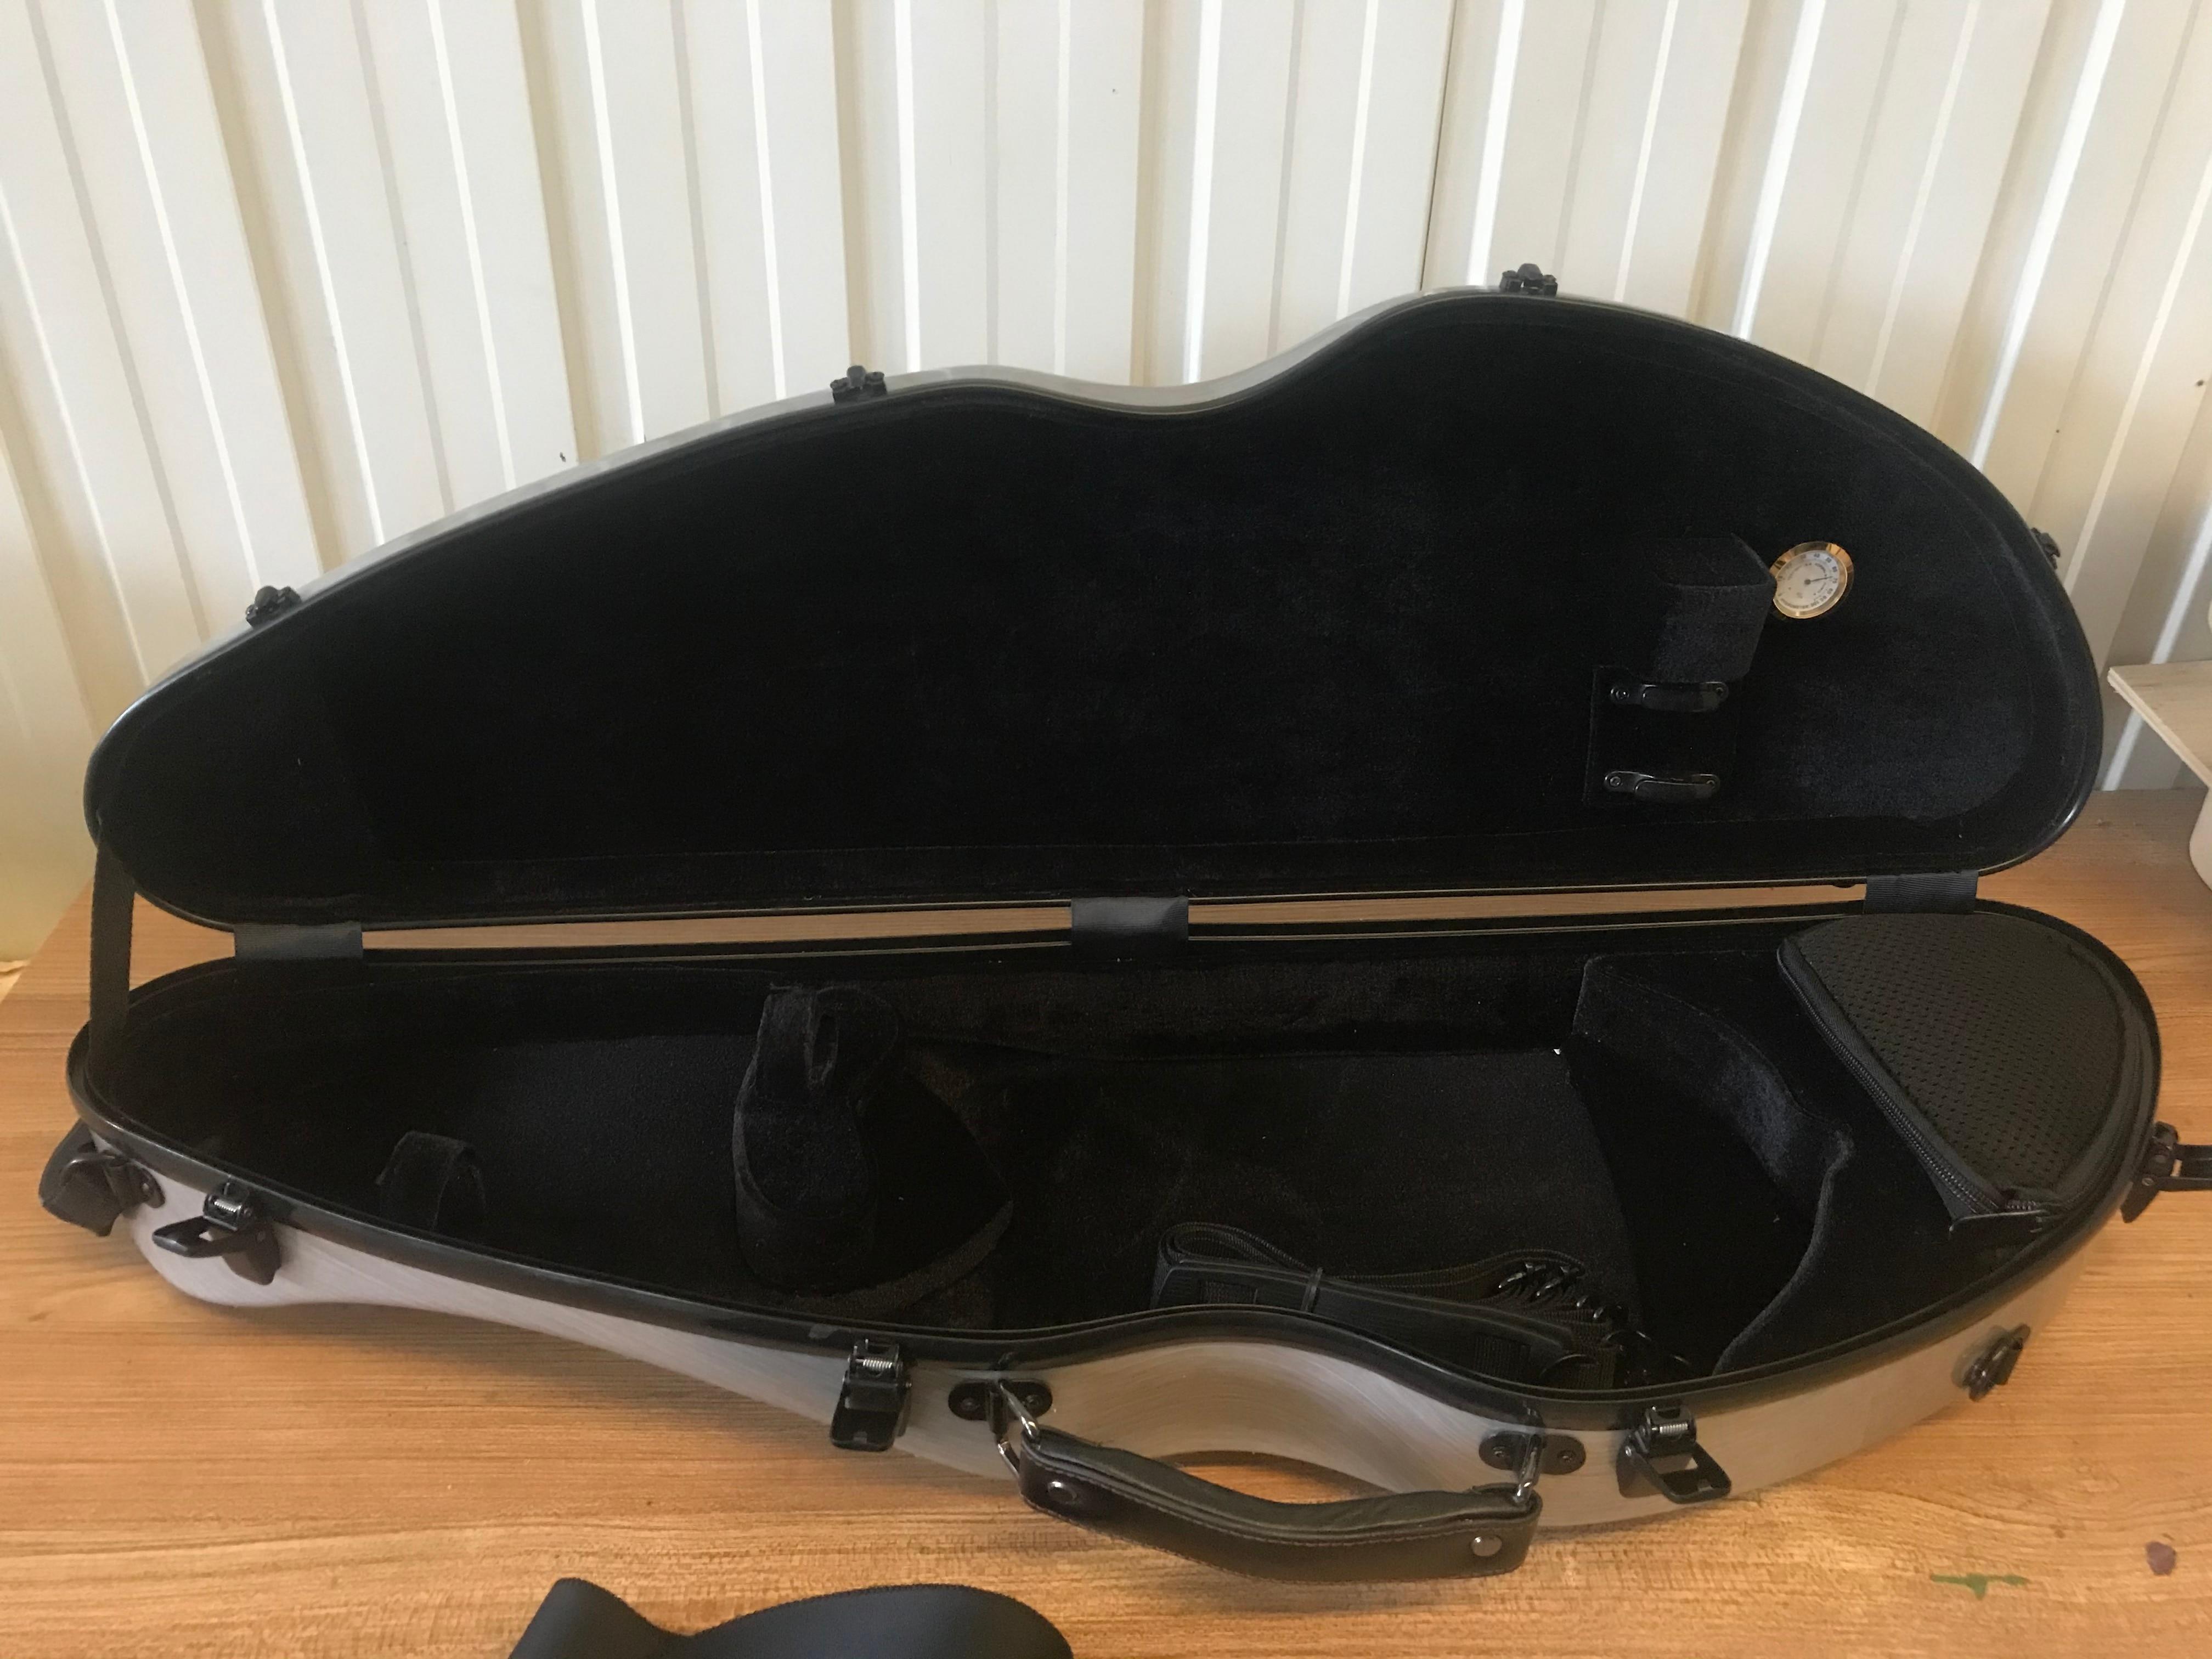 Advanced 3/4 Violin Case Carbon Fiber Triangle Box Light Strong Waterproof Wear-resistant Steel Style Hard Box enlarge